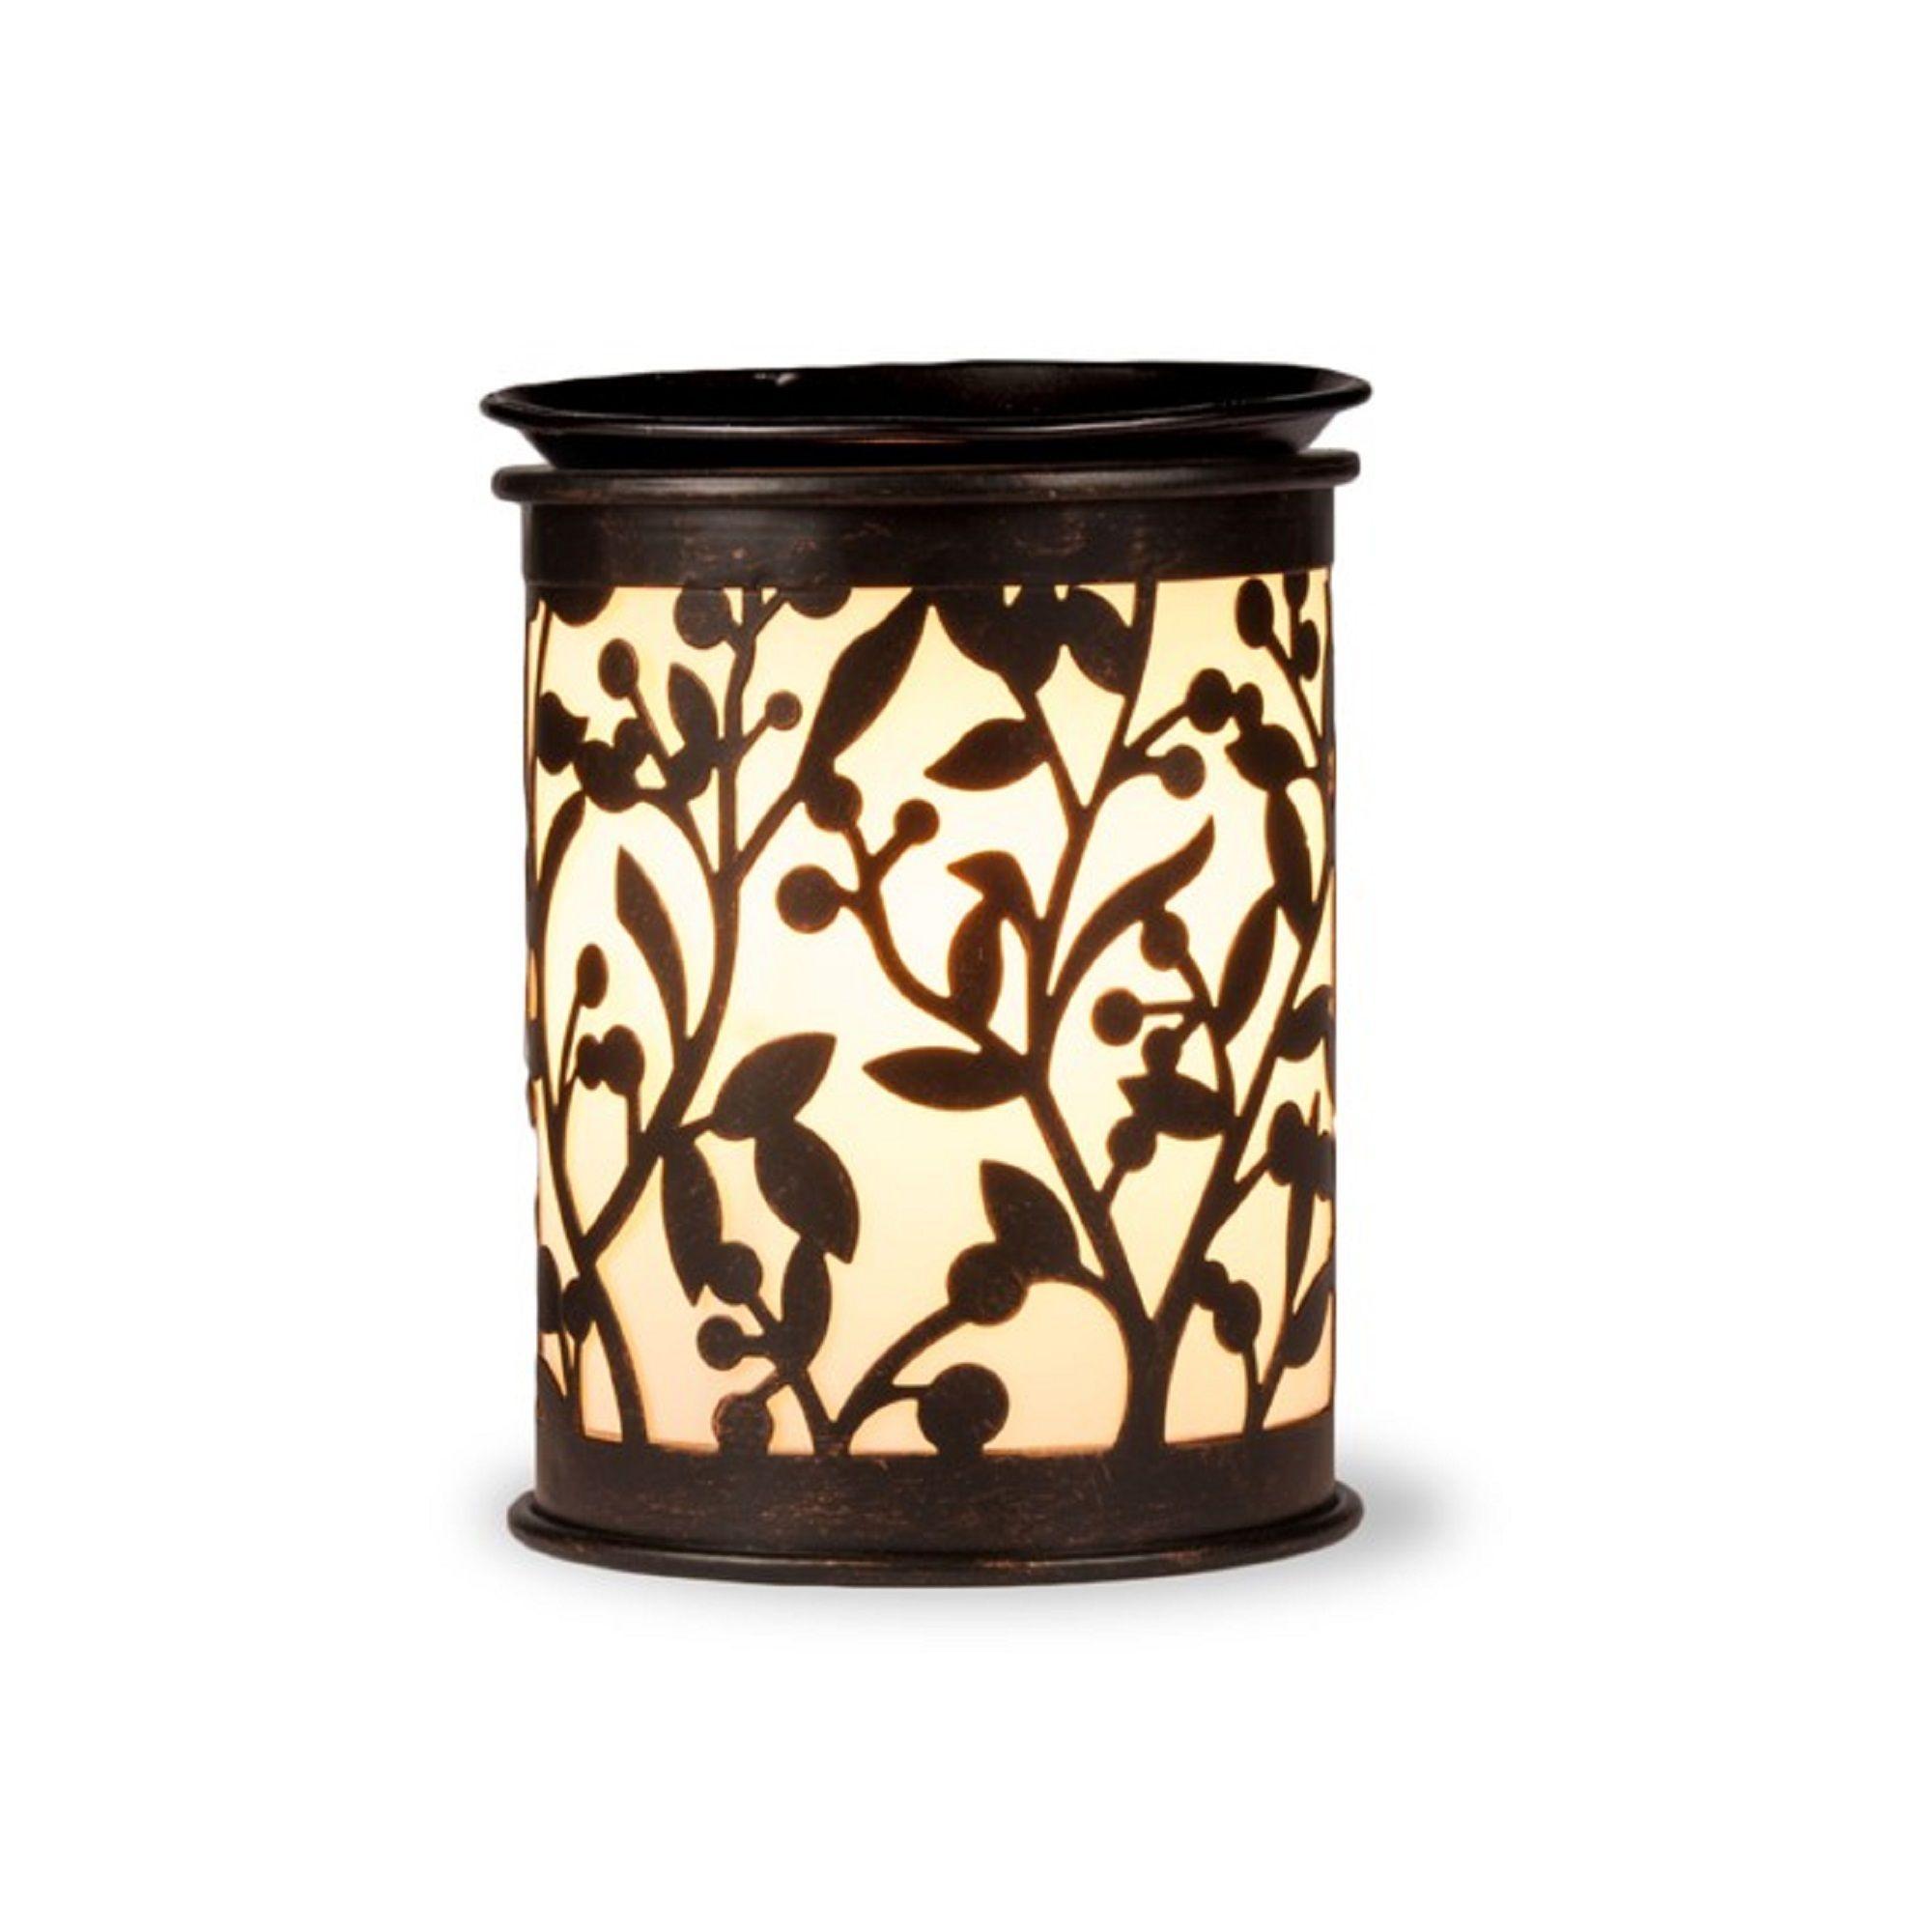 9e2d49dbd1cf3753341374bc00a8b0a1 - Better Homes And Gardens Candle Warmer Light Bulb